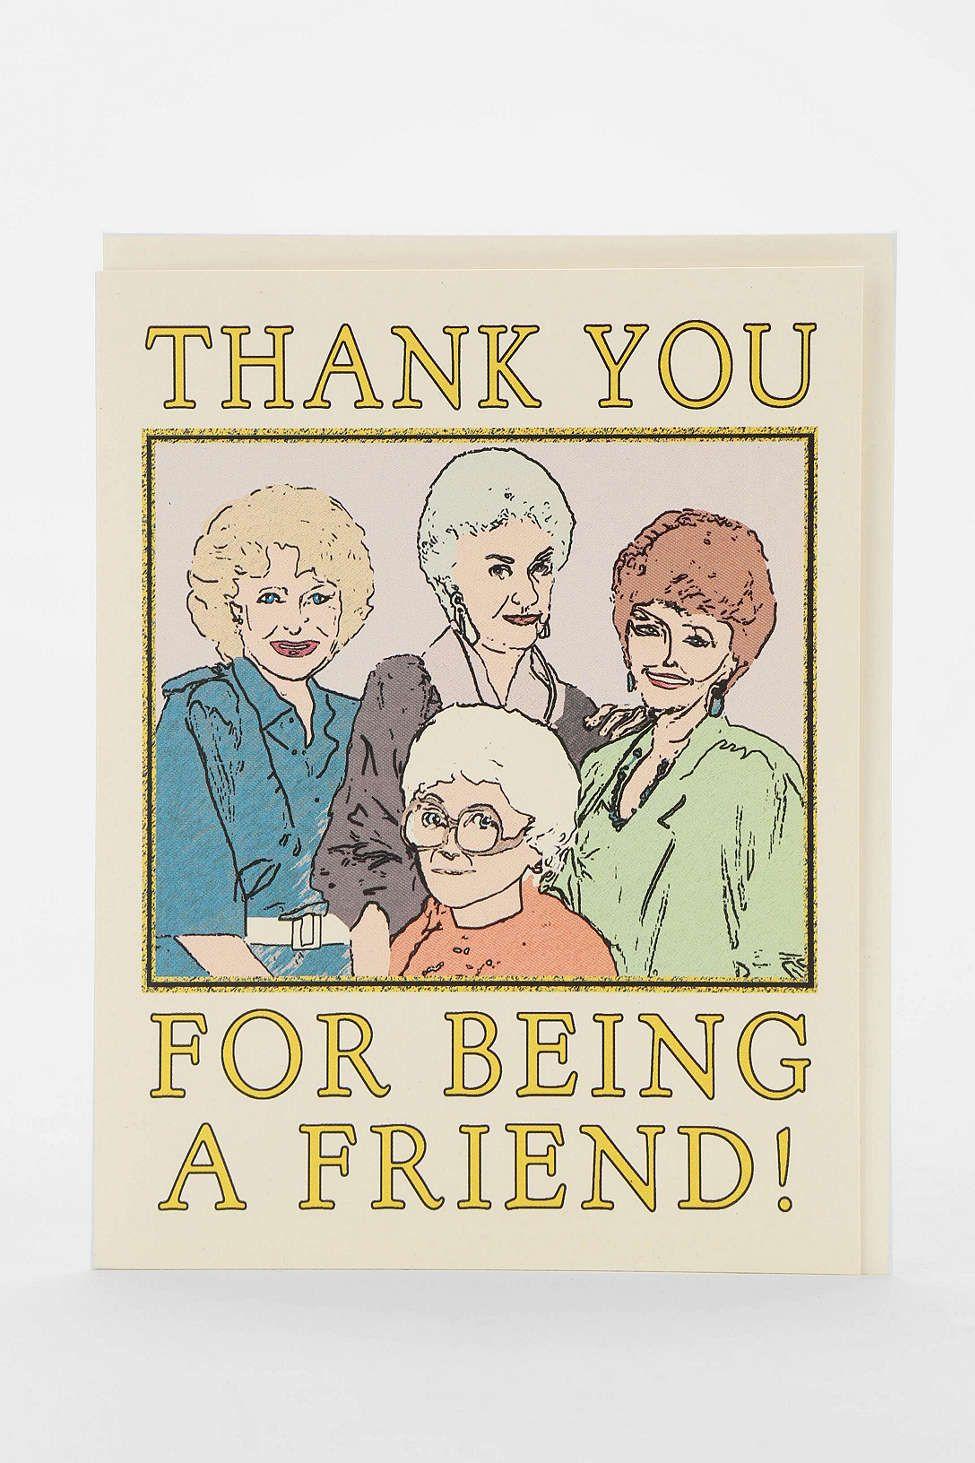 seas and peas golden girls thank you card g r e e t paper hellos